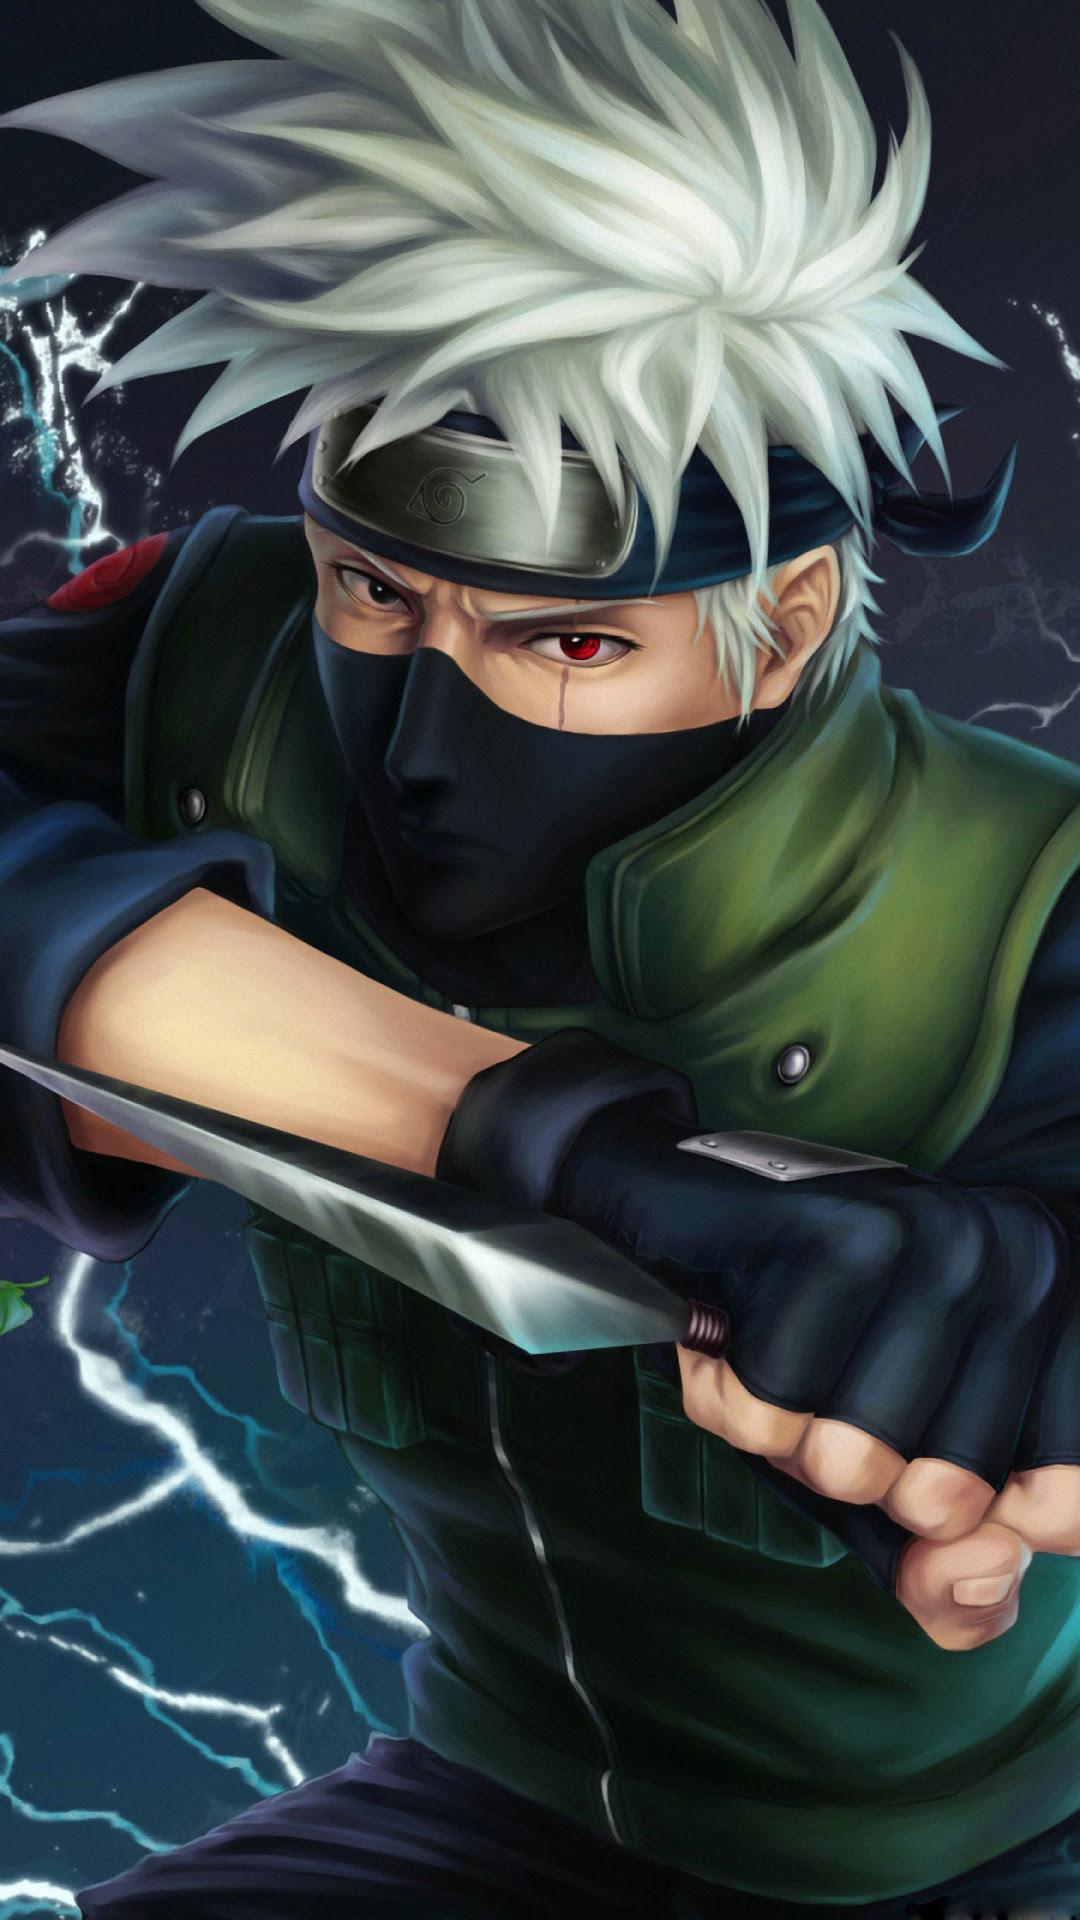 Unduh 60+ Wallpaper Naruto Keren Android HD Paling Keren